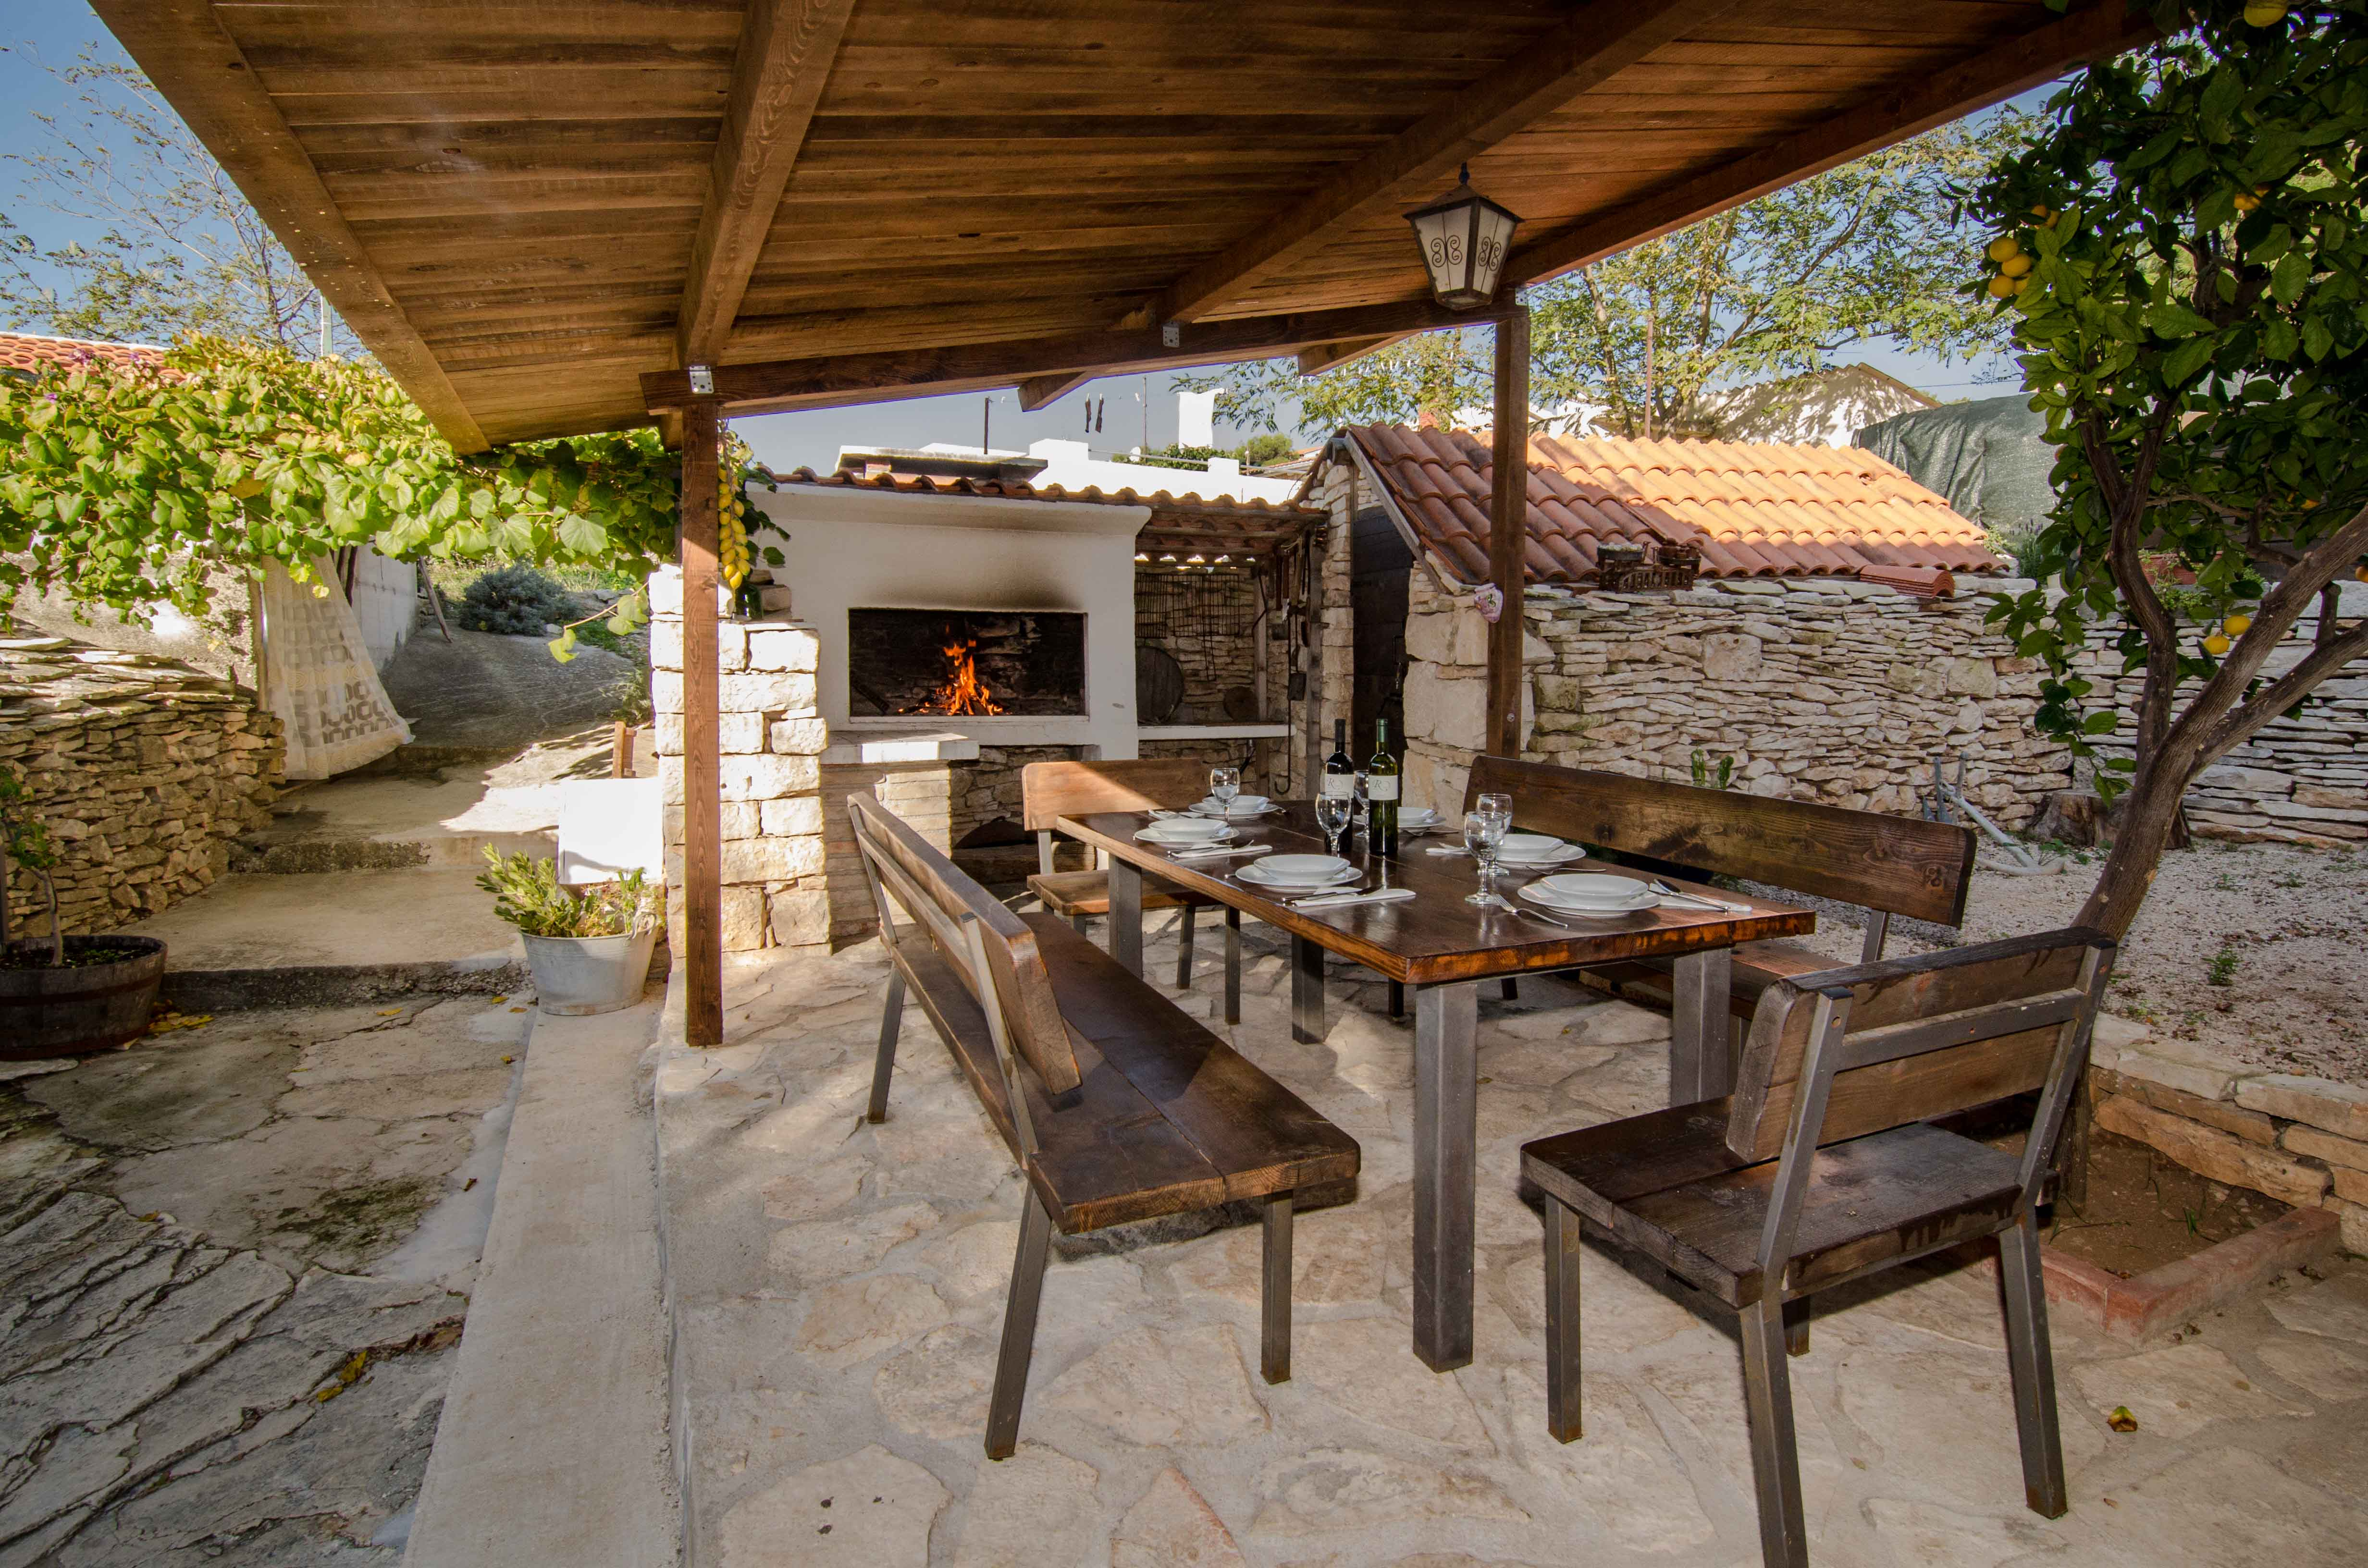 Active holidays - Island of Vis - Croatia - accommodation